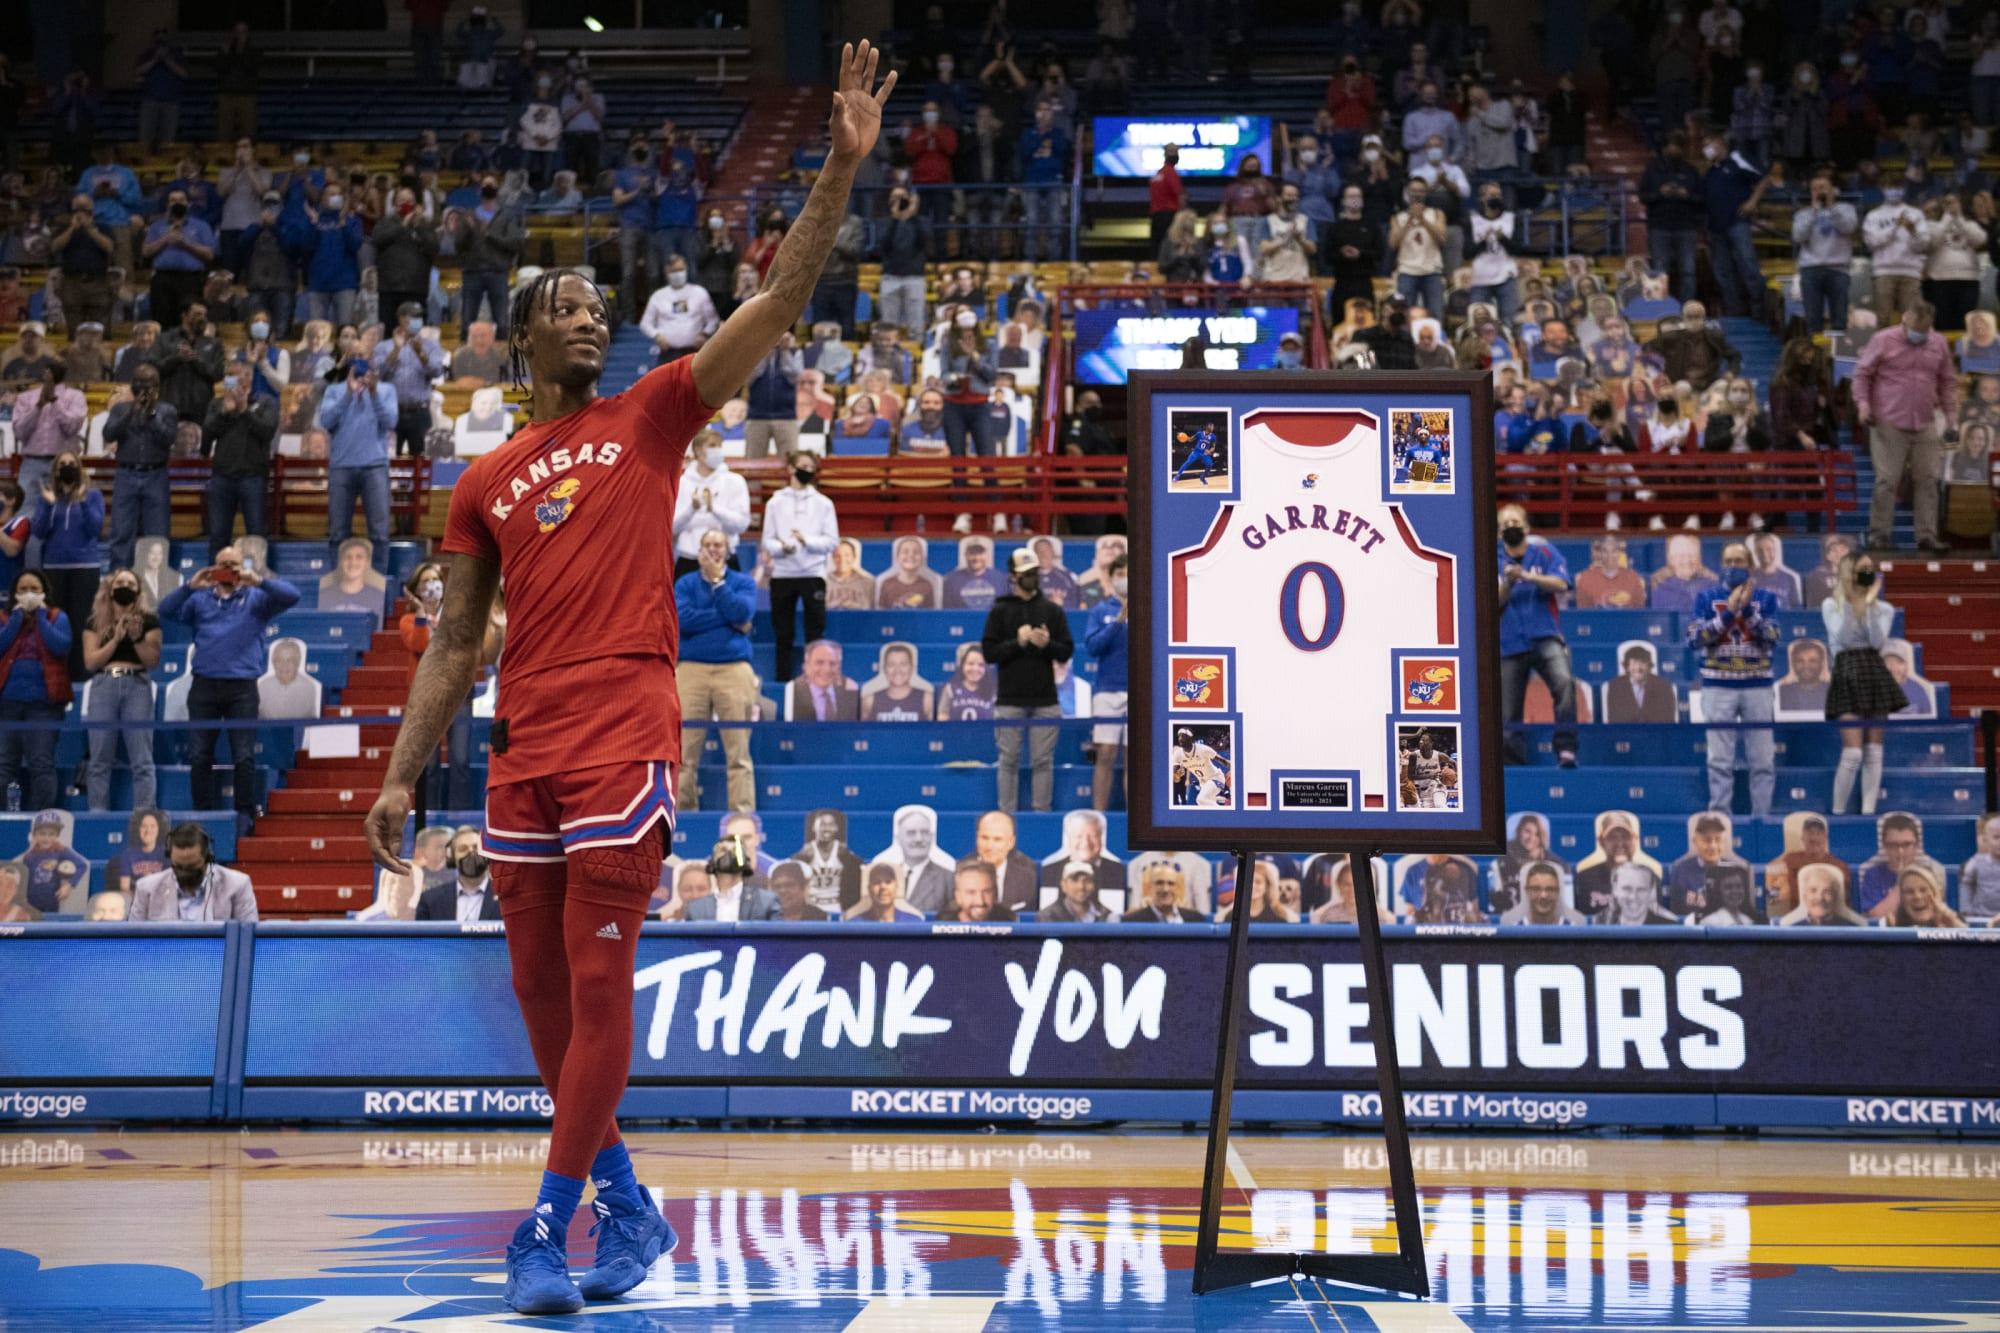 Kansas basketball's Marcus Garrett bids farewell with a major win against Baylor on Senior Night